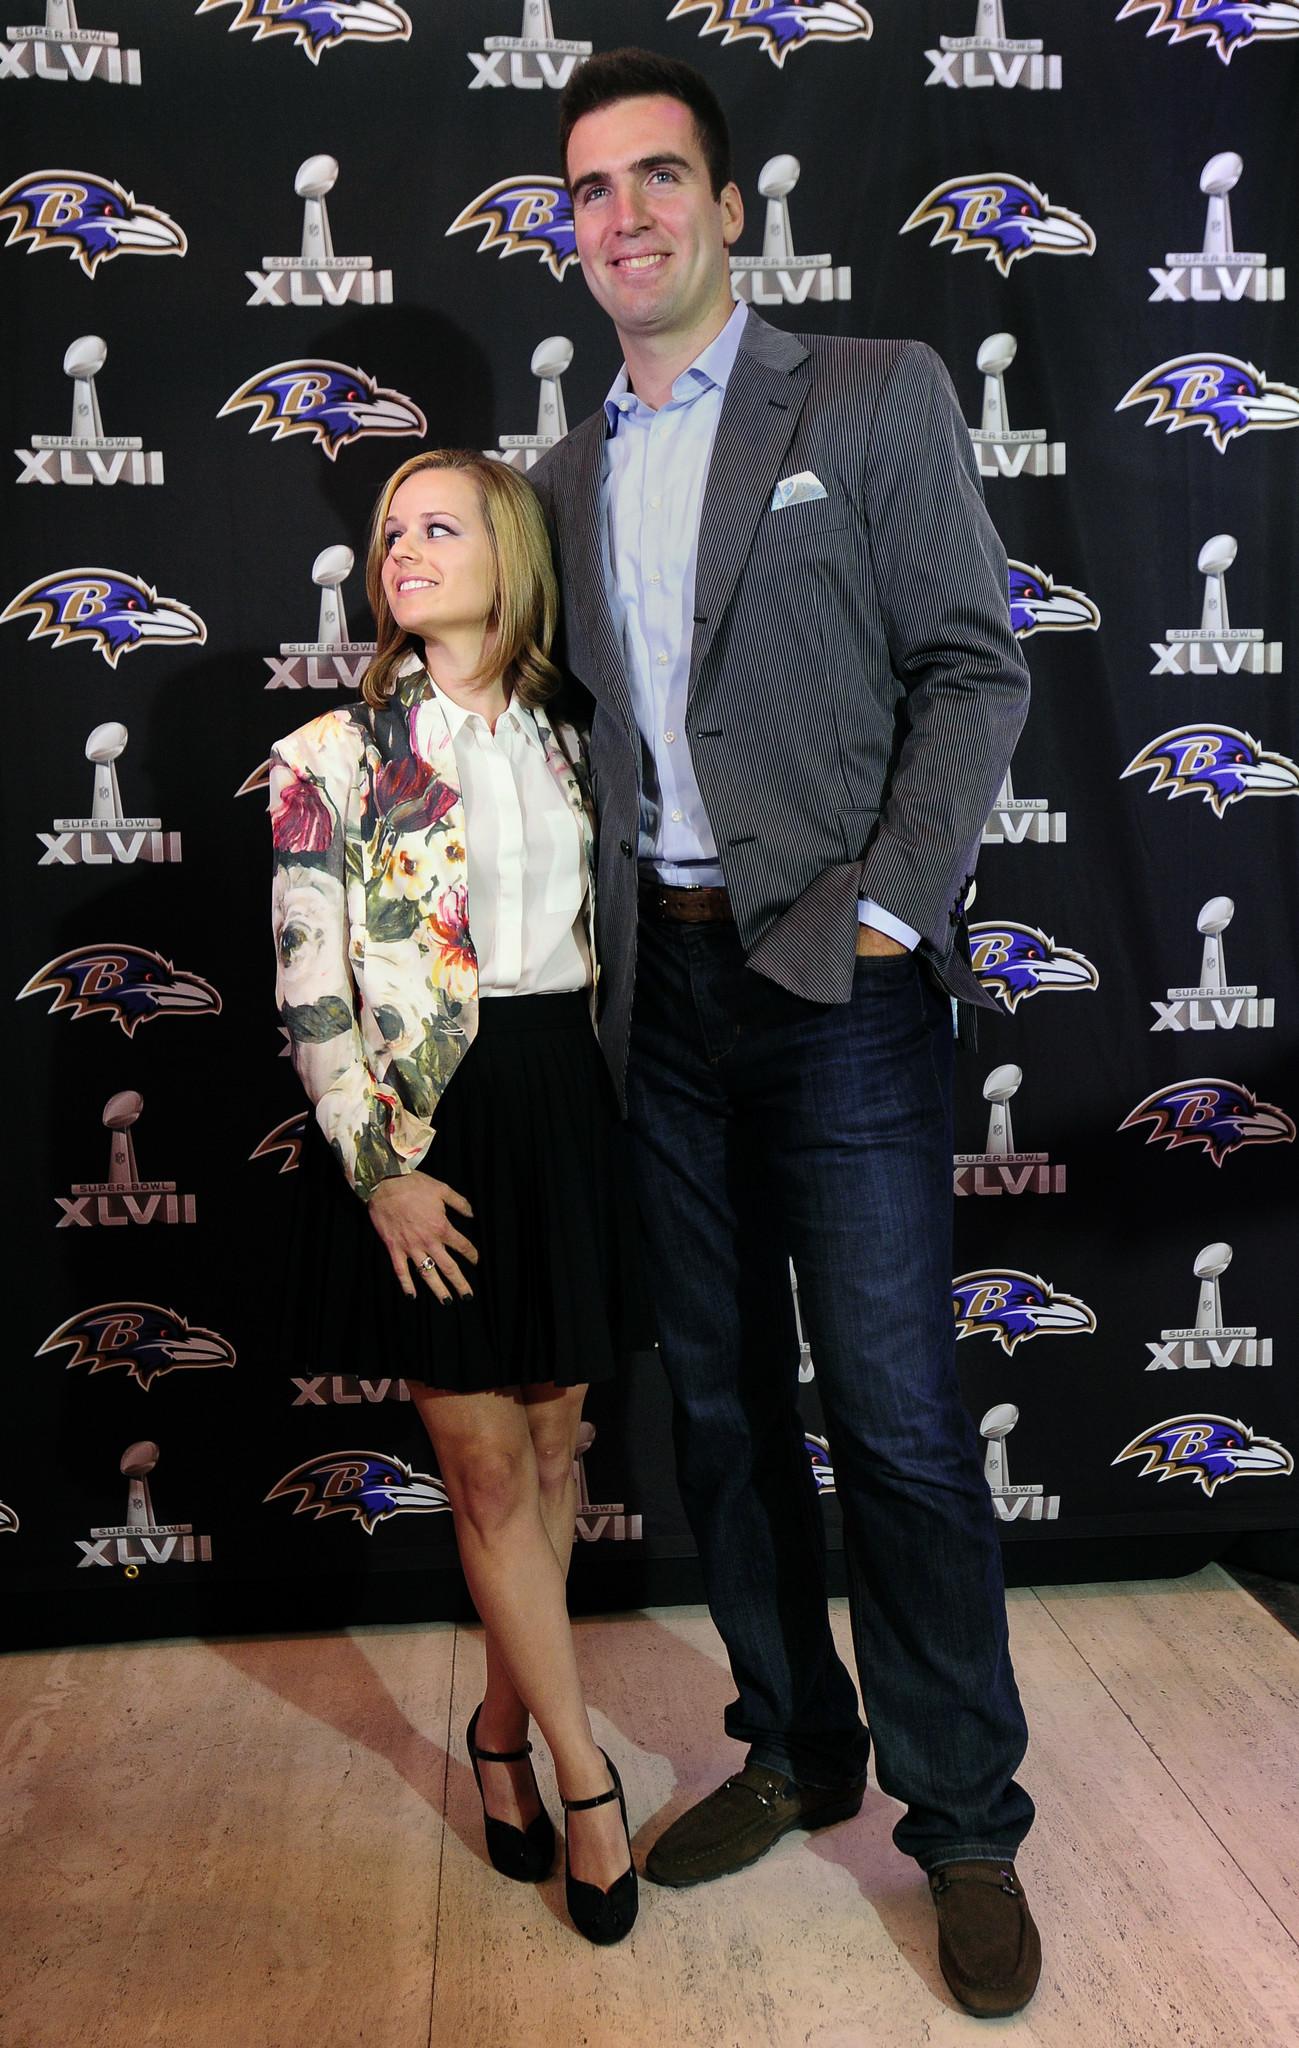 Bal-ravens-quarterback-joe-flacco-family-welcomed-fourth-child-tuesday-20160928